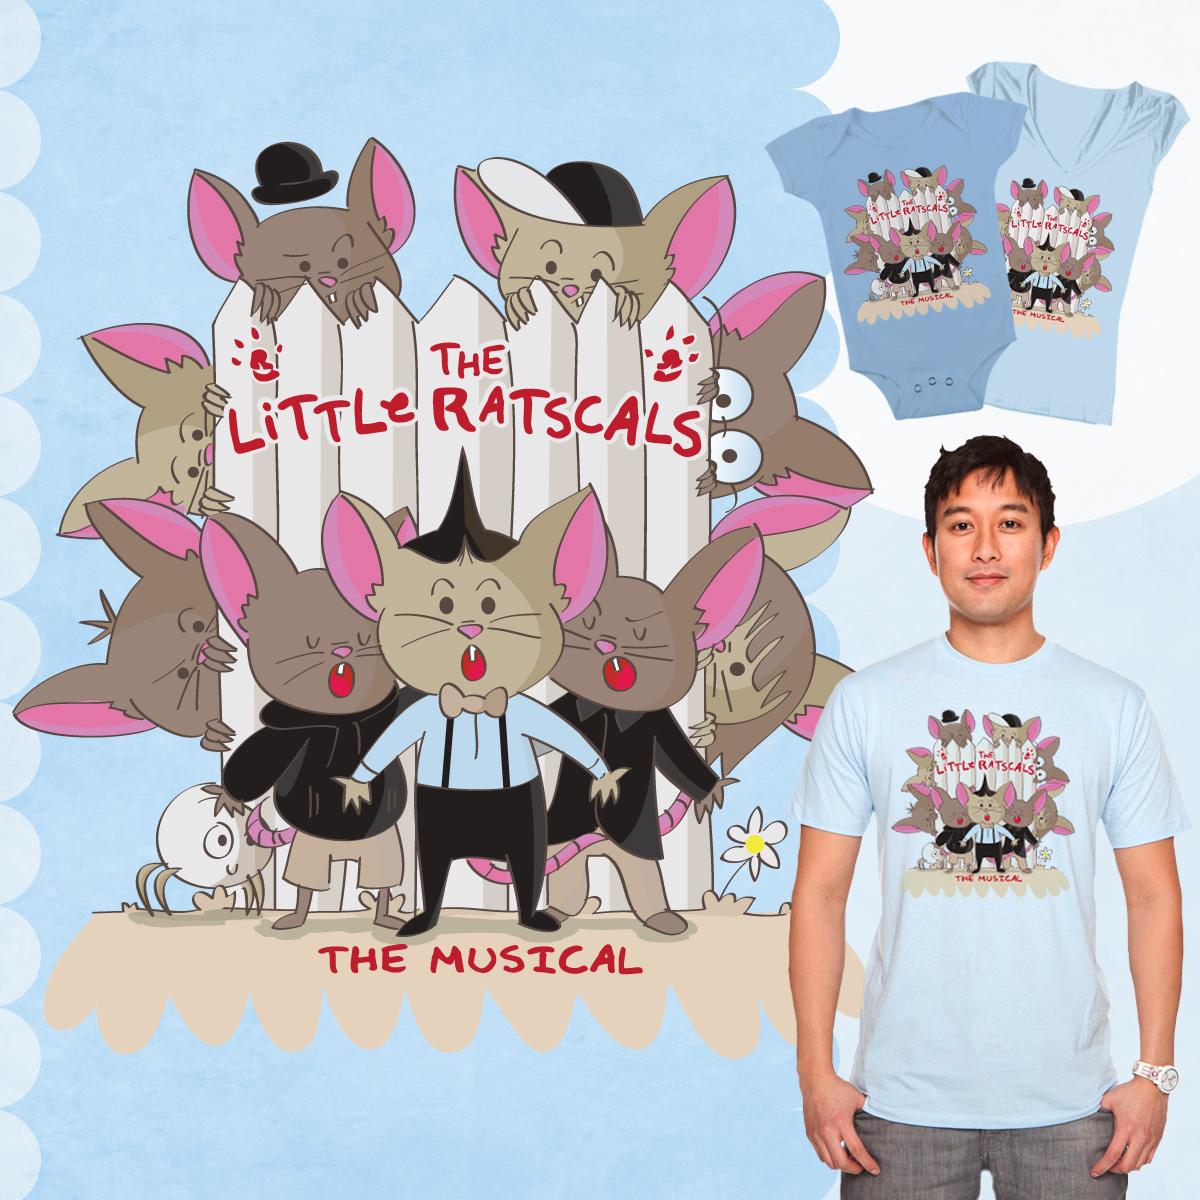 The Little Ratscals by hurstdrew on Threadless